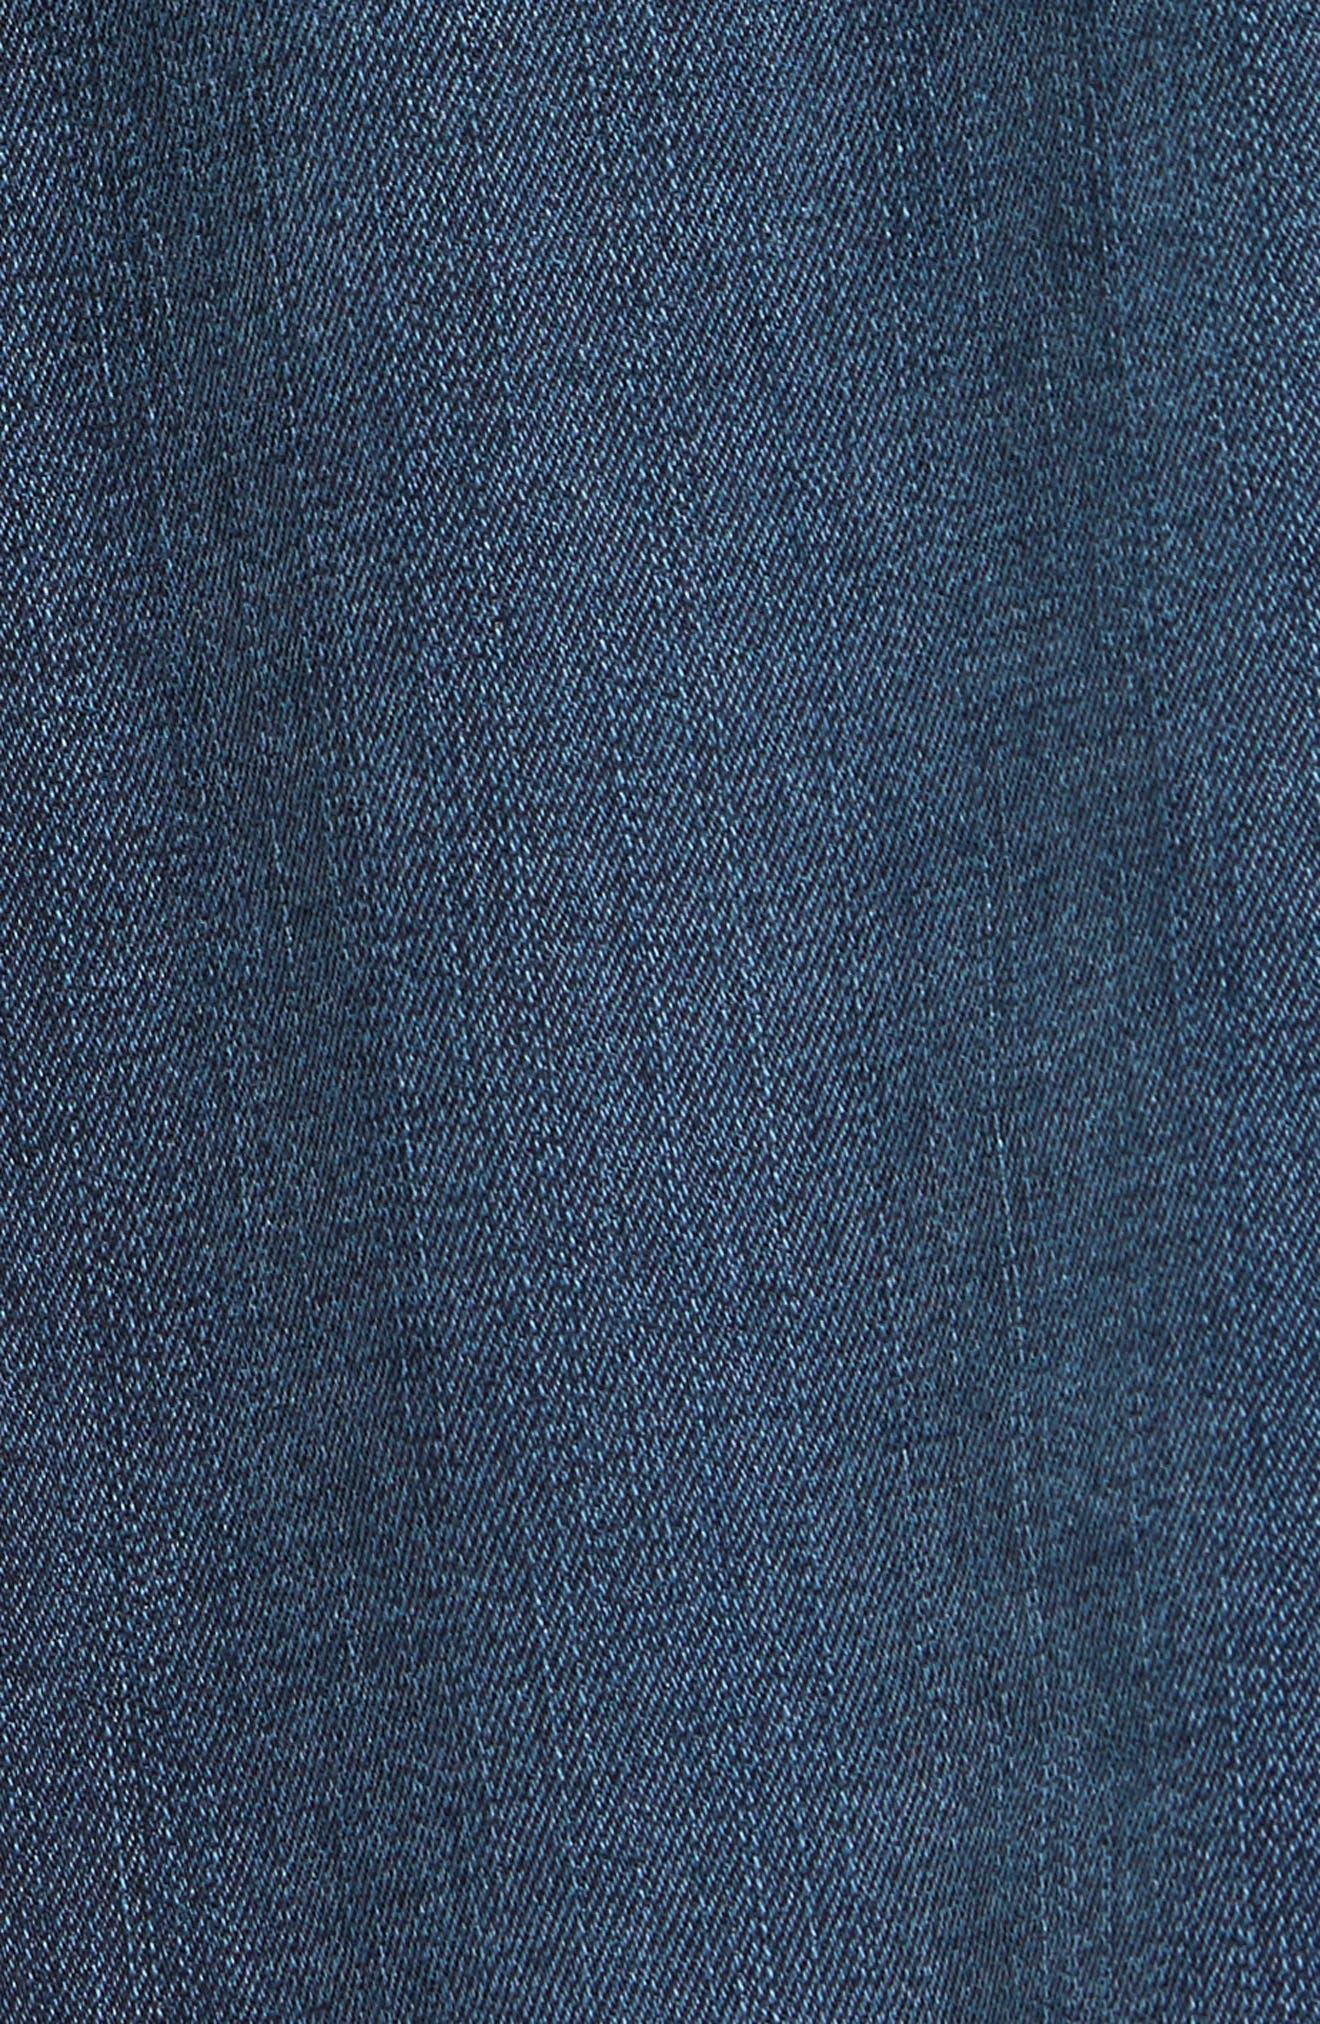 Reese Straight Leg Jeans,                             Alternate thumbnail 5, color,